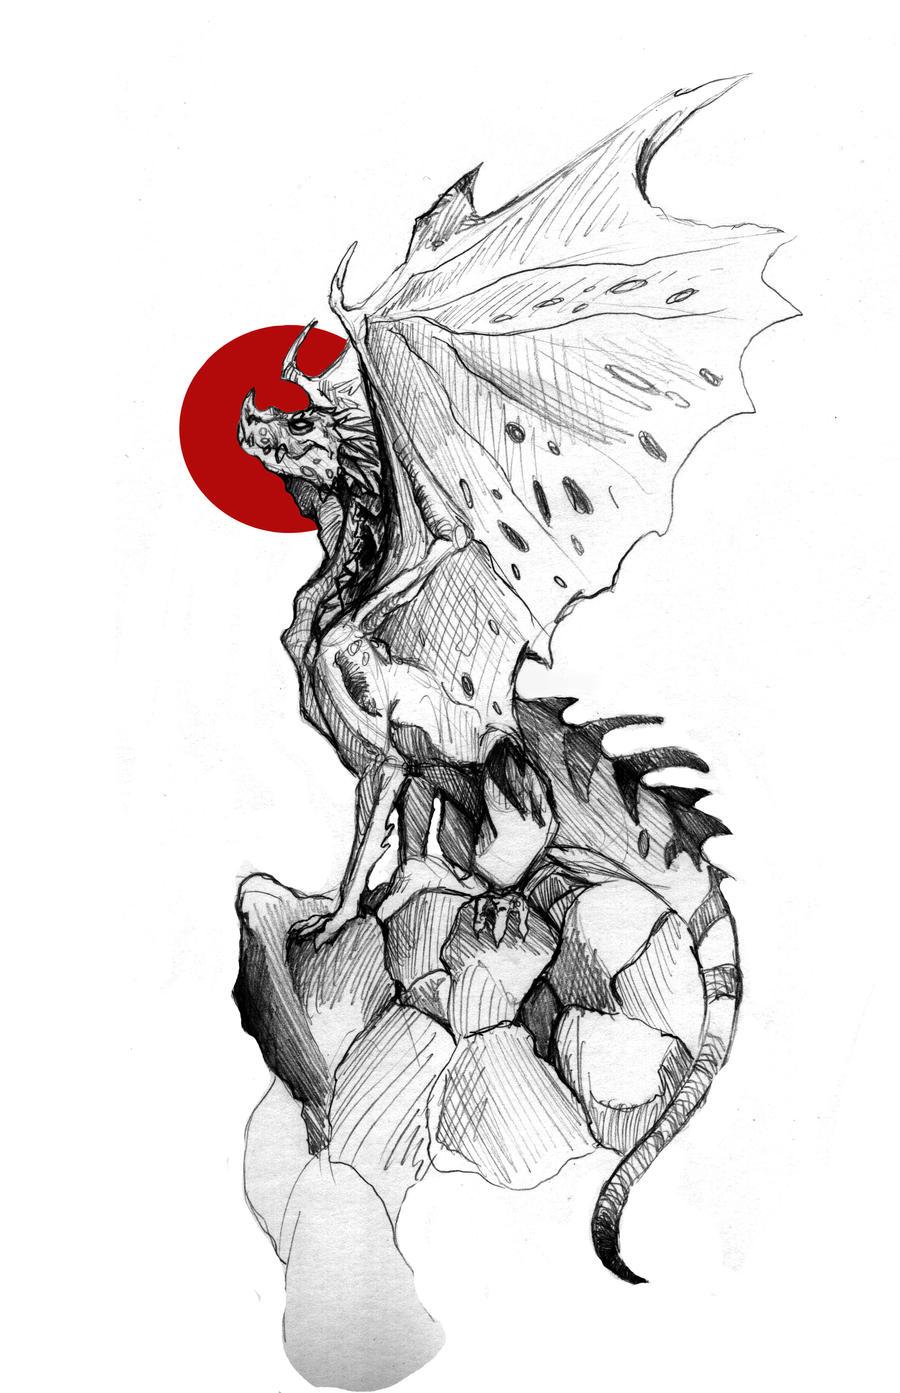 TADA LaZy Art by mec-canic